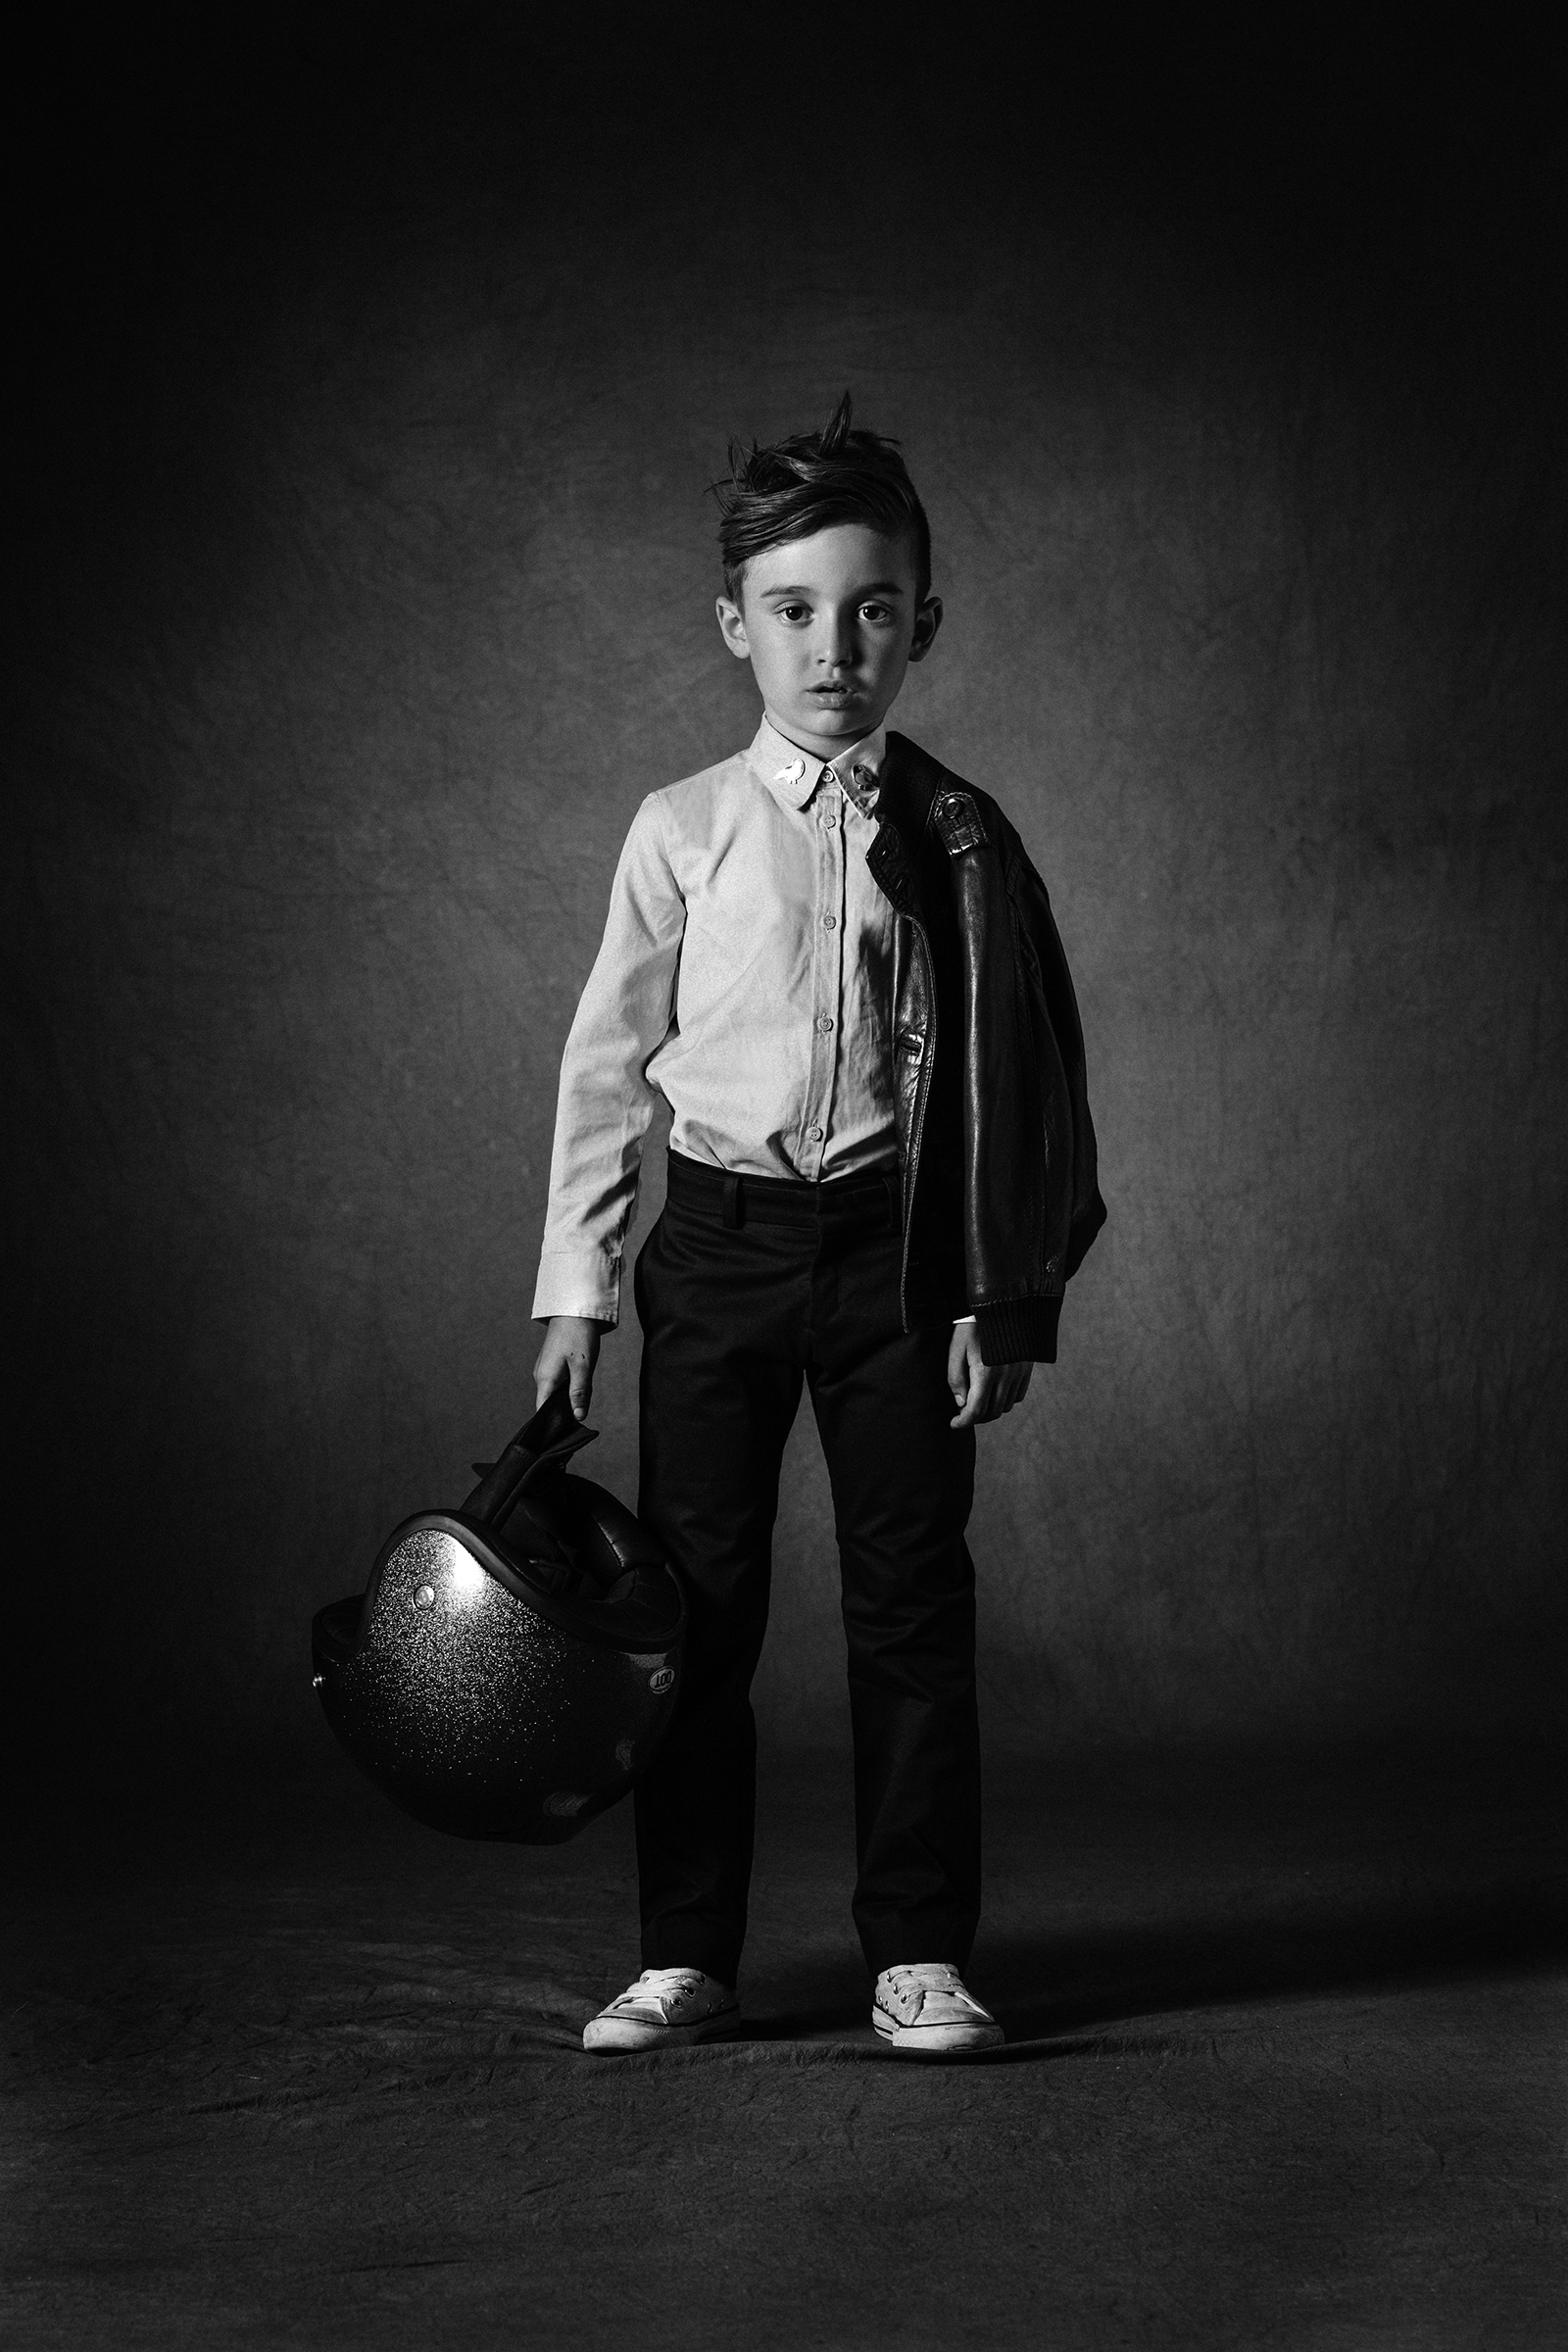 alonso_mateo_kids_fashion_felicidad_de_lucas_photographer_003.jpg